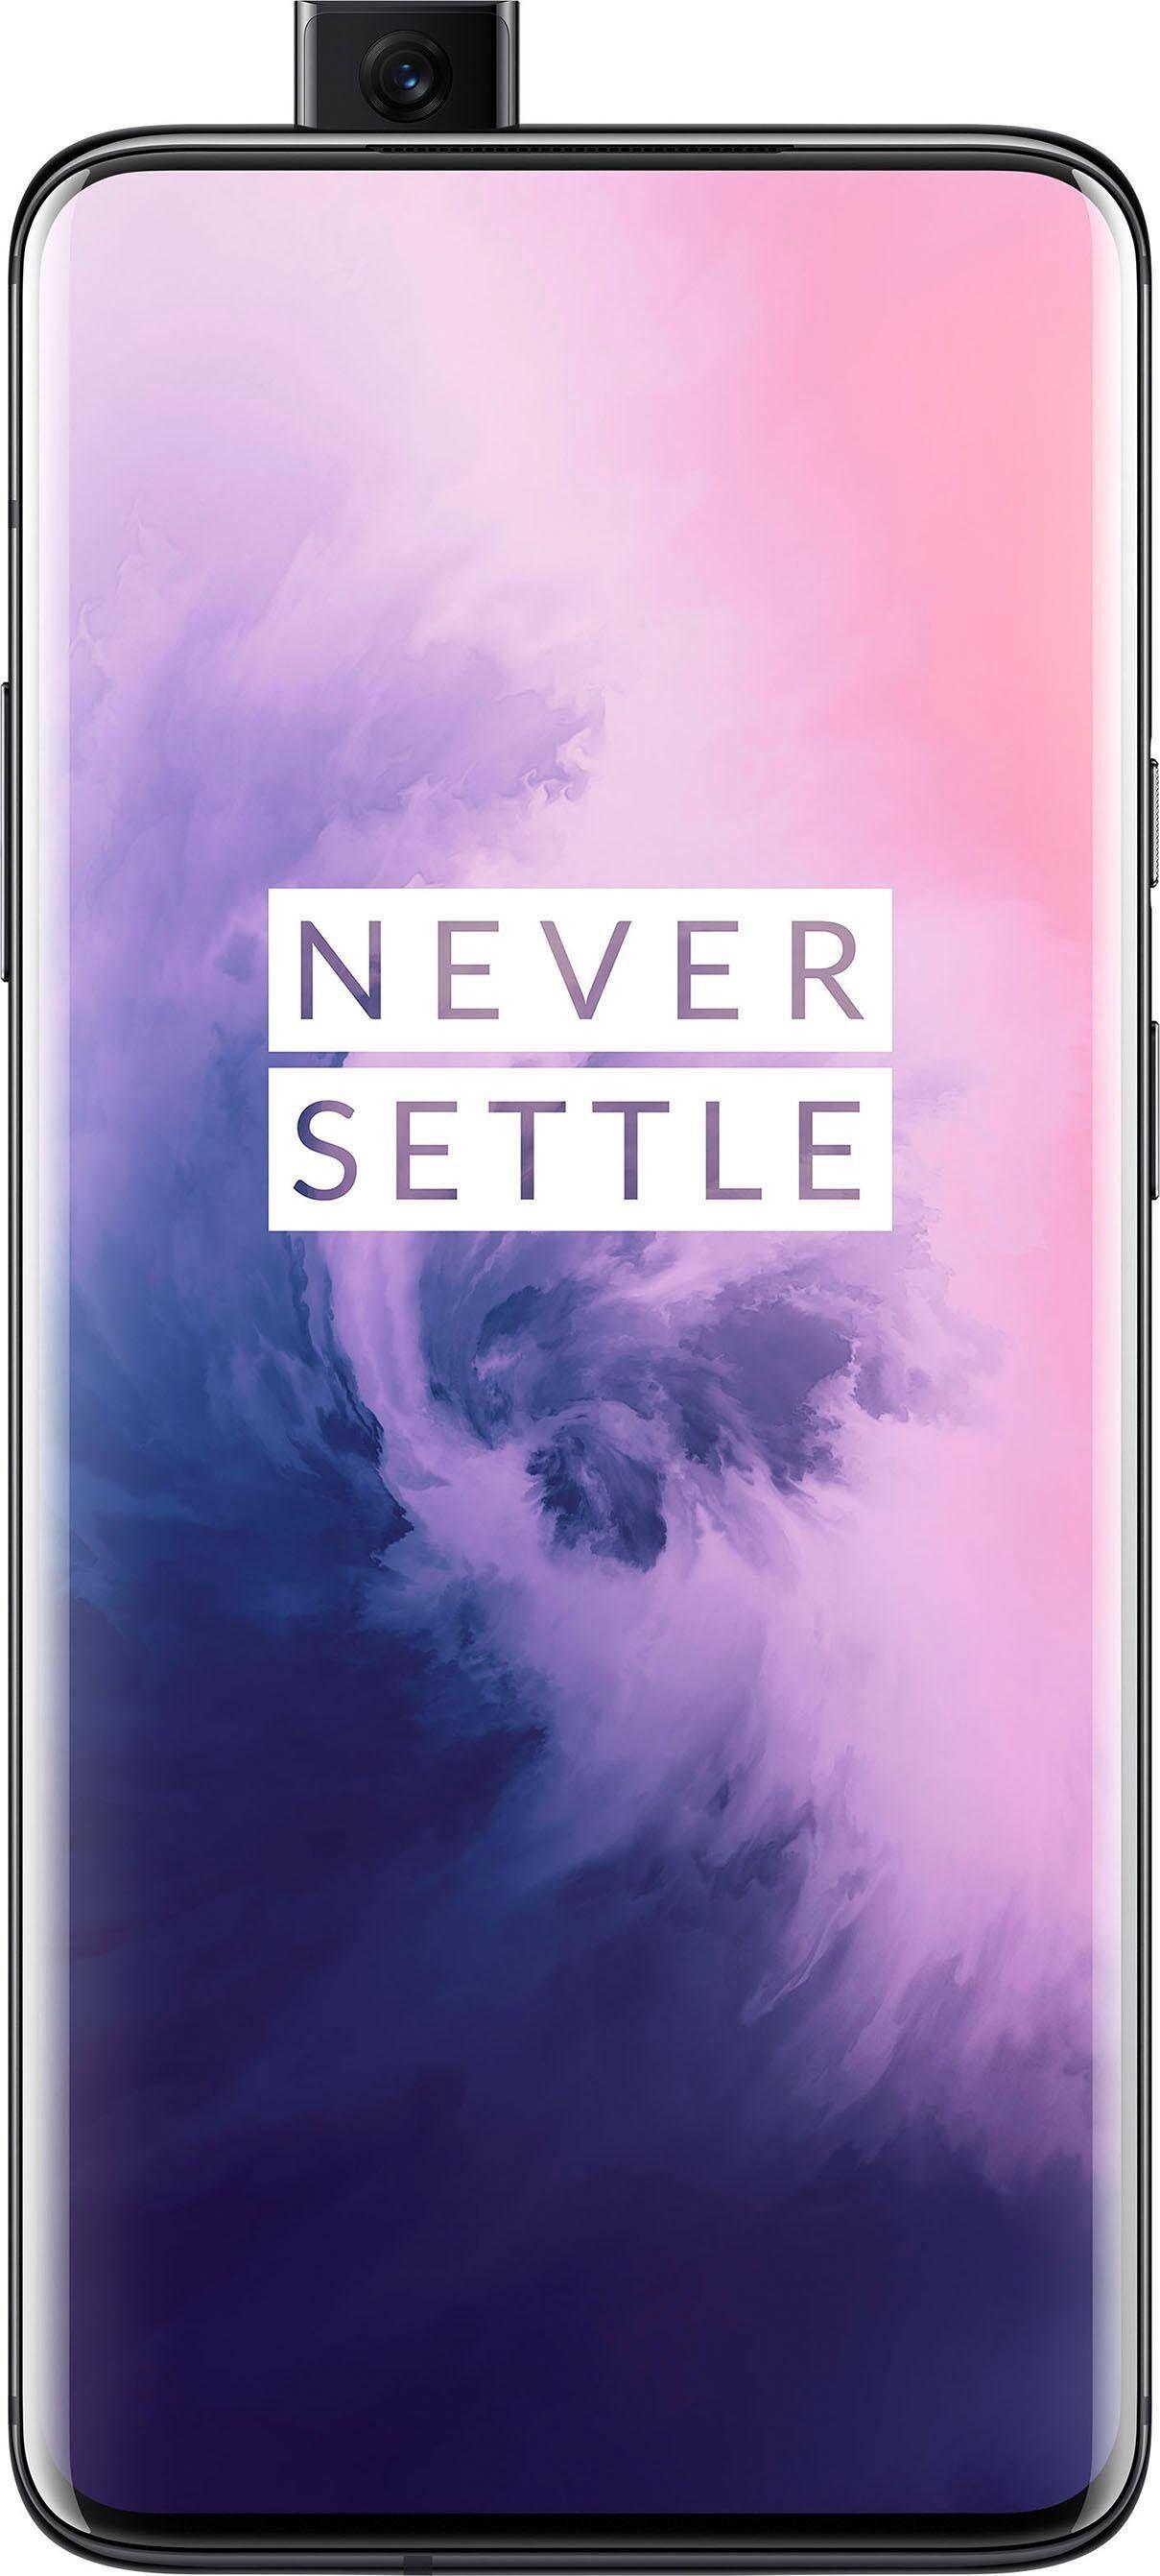 OnePlus 7 Pro 8GB+256GB Smartphone (16,9 cm/6,7 Zoll, 256 GB Speicherplatz, 48 MP Kamera), mirror gray